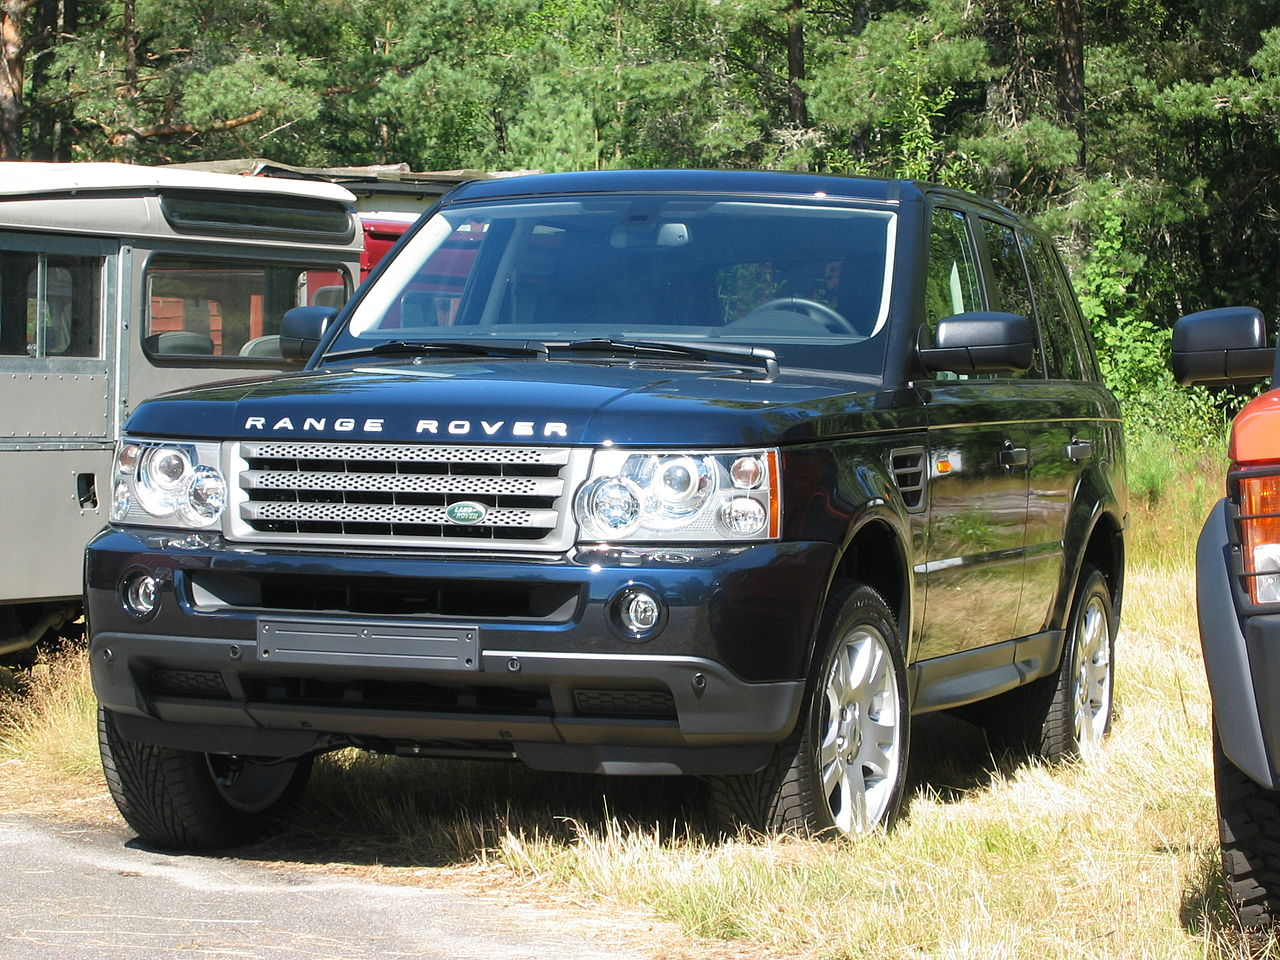 Rover range rover 2005 : File:2005 Range Rover Sport front q.jpg - Wikimedia Commons